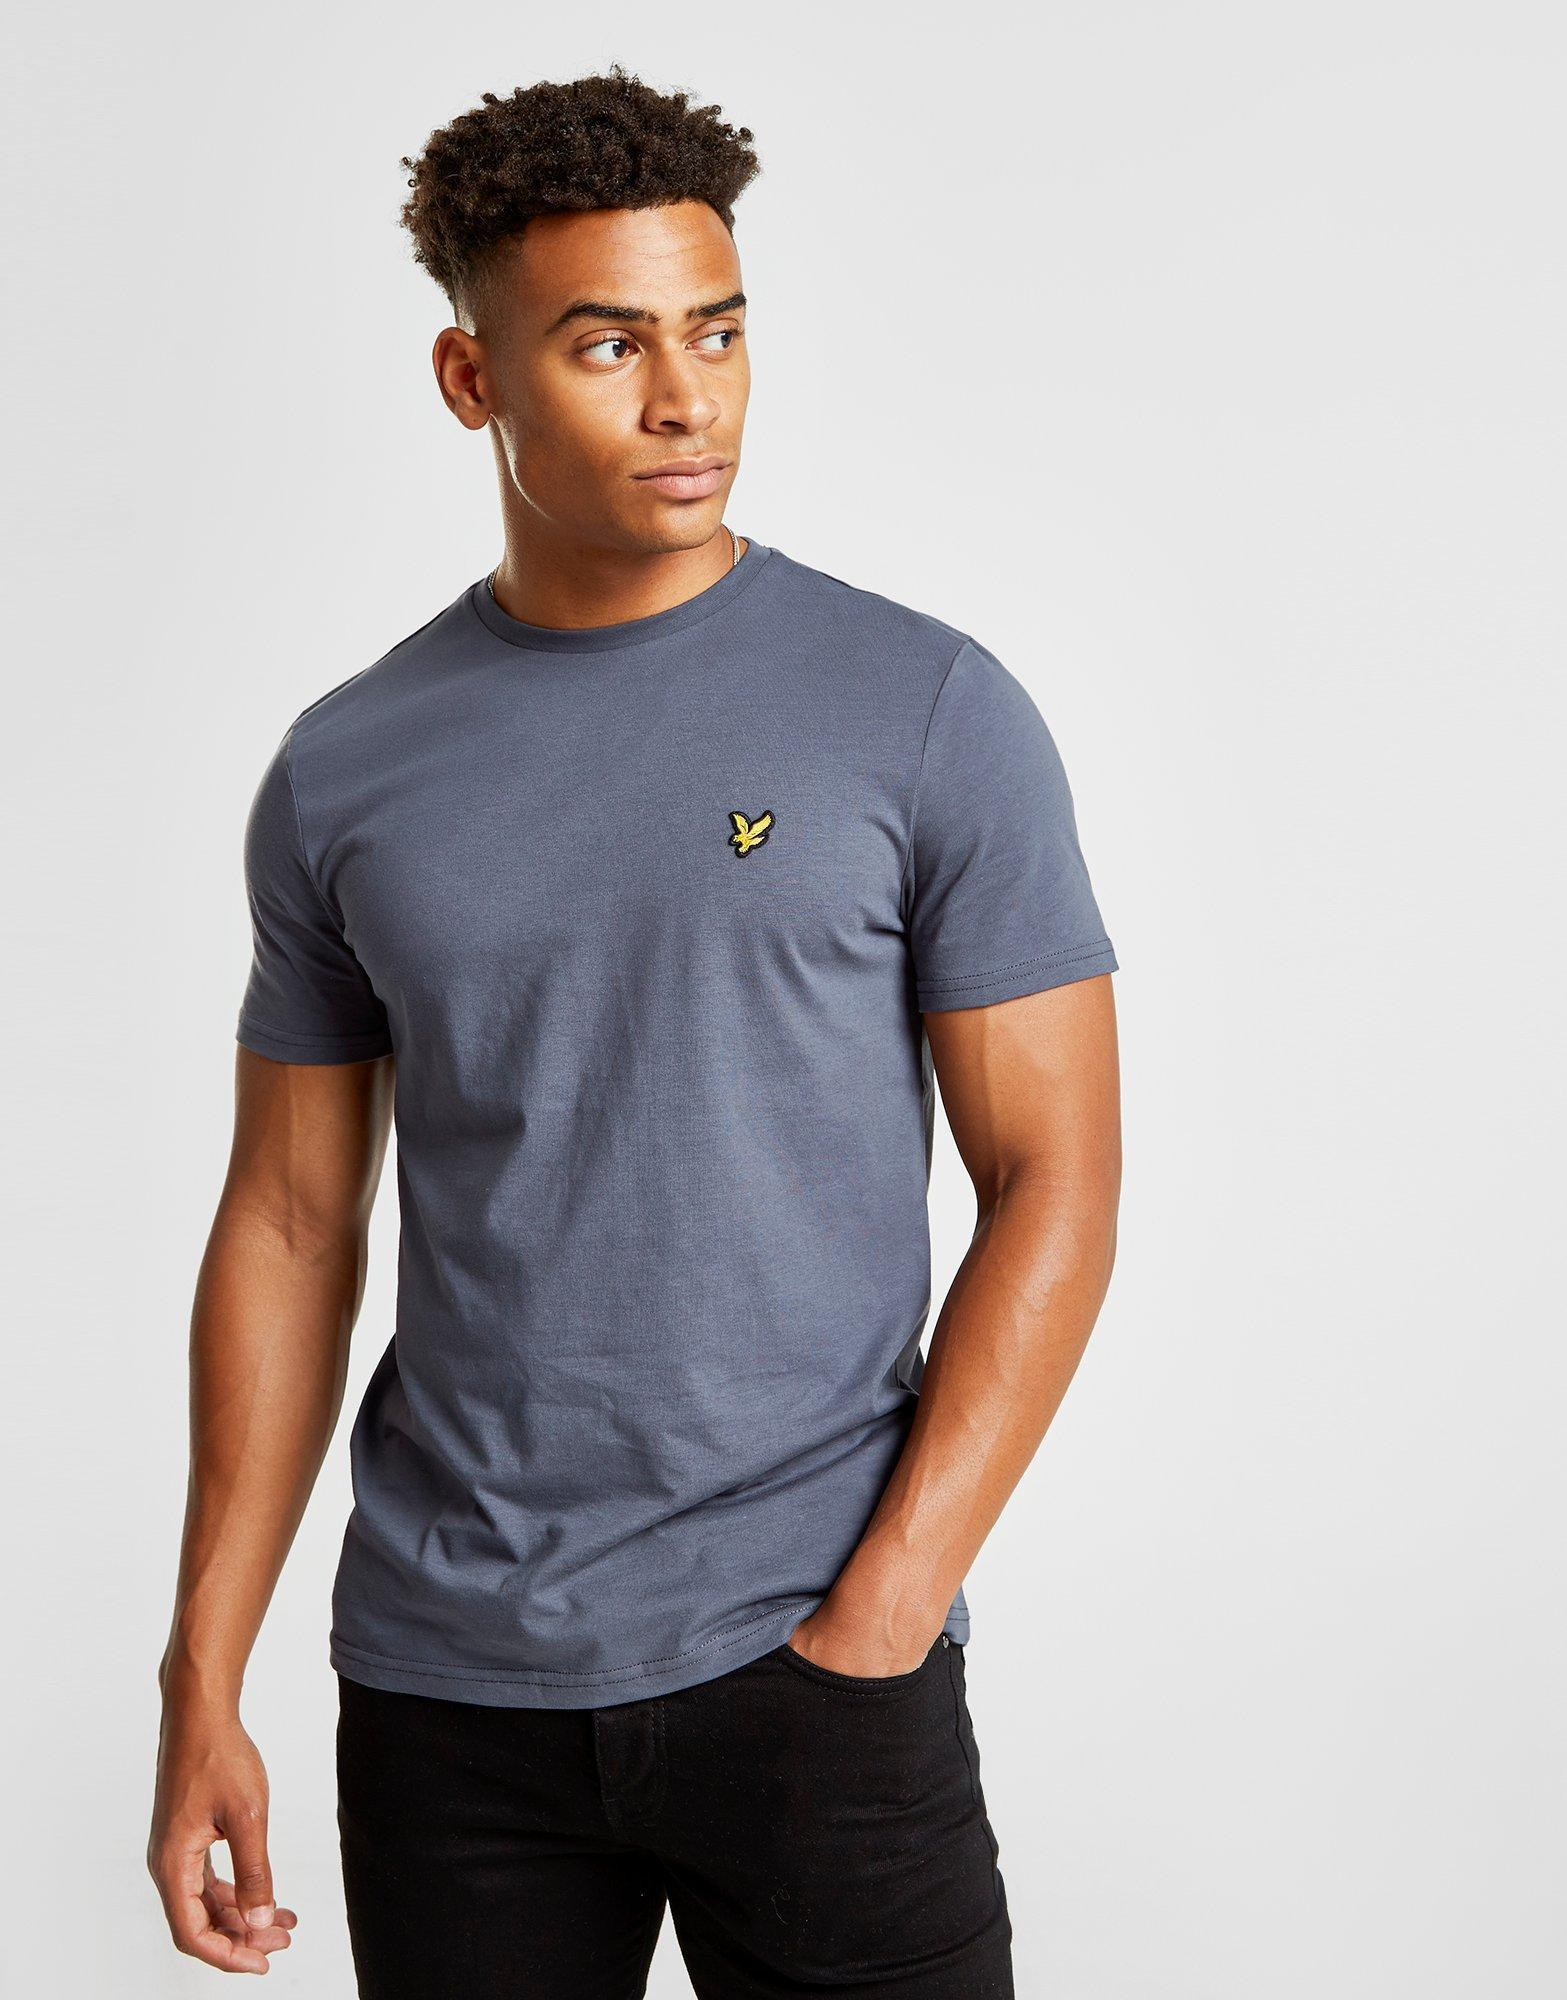 692044817 Lyst - Lyle & Scott Short Sleeve Core T-shirt in Gray for Men